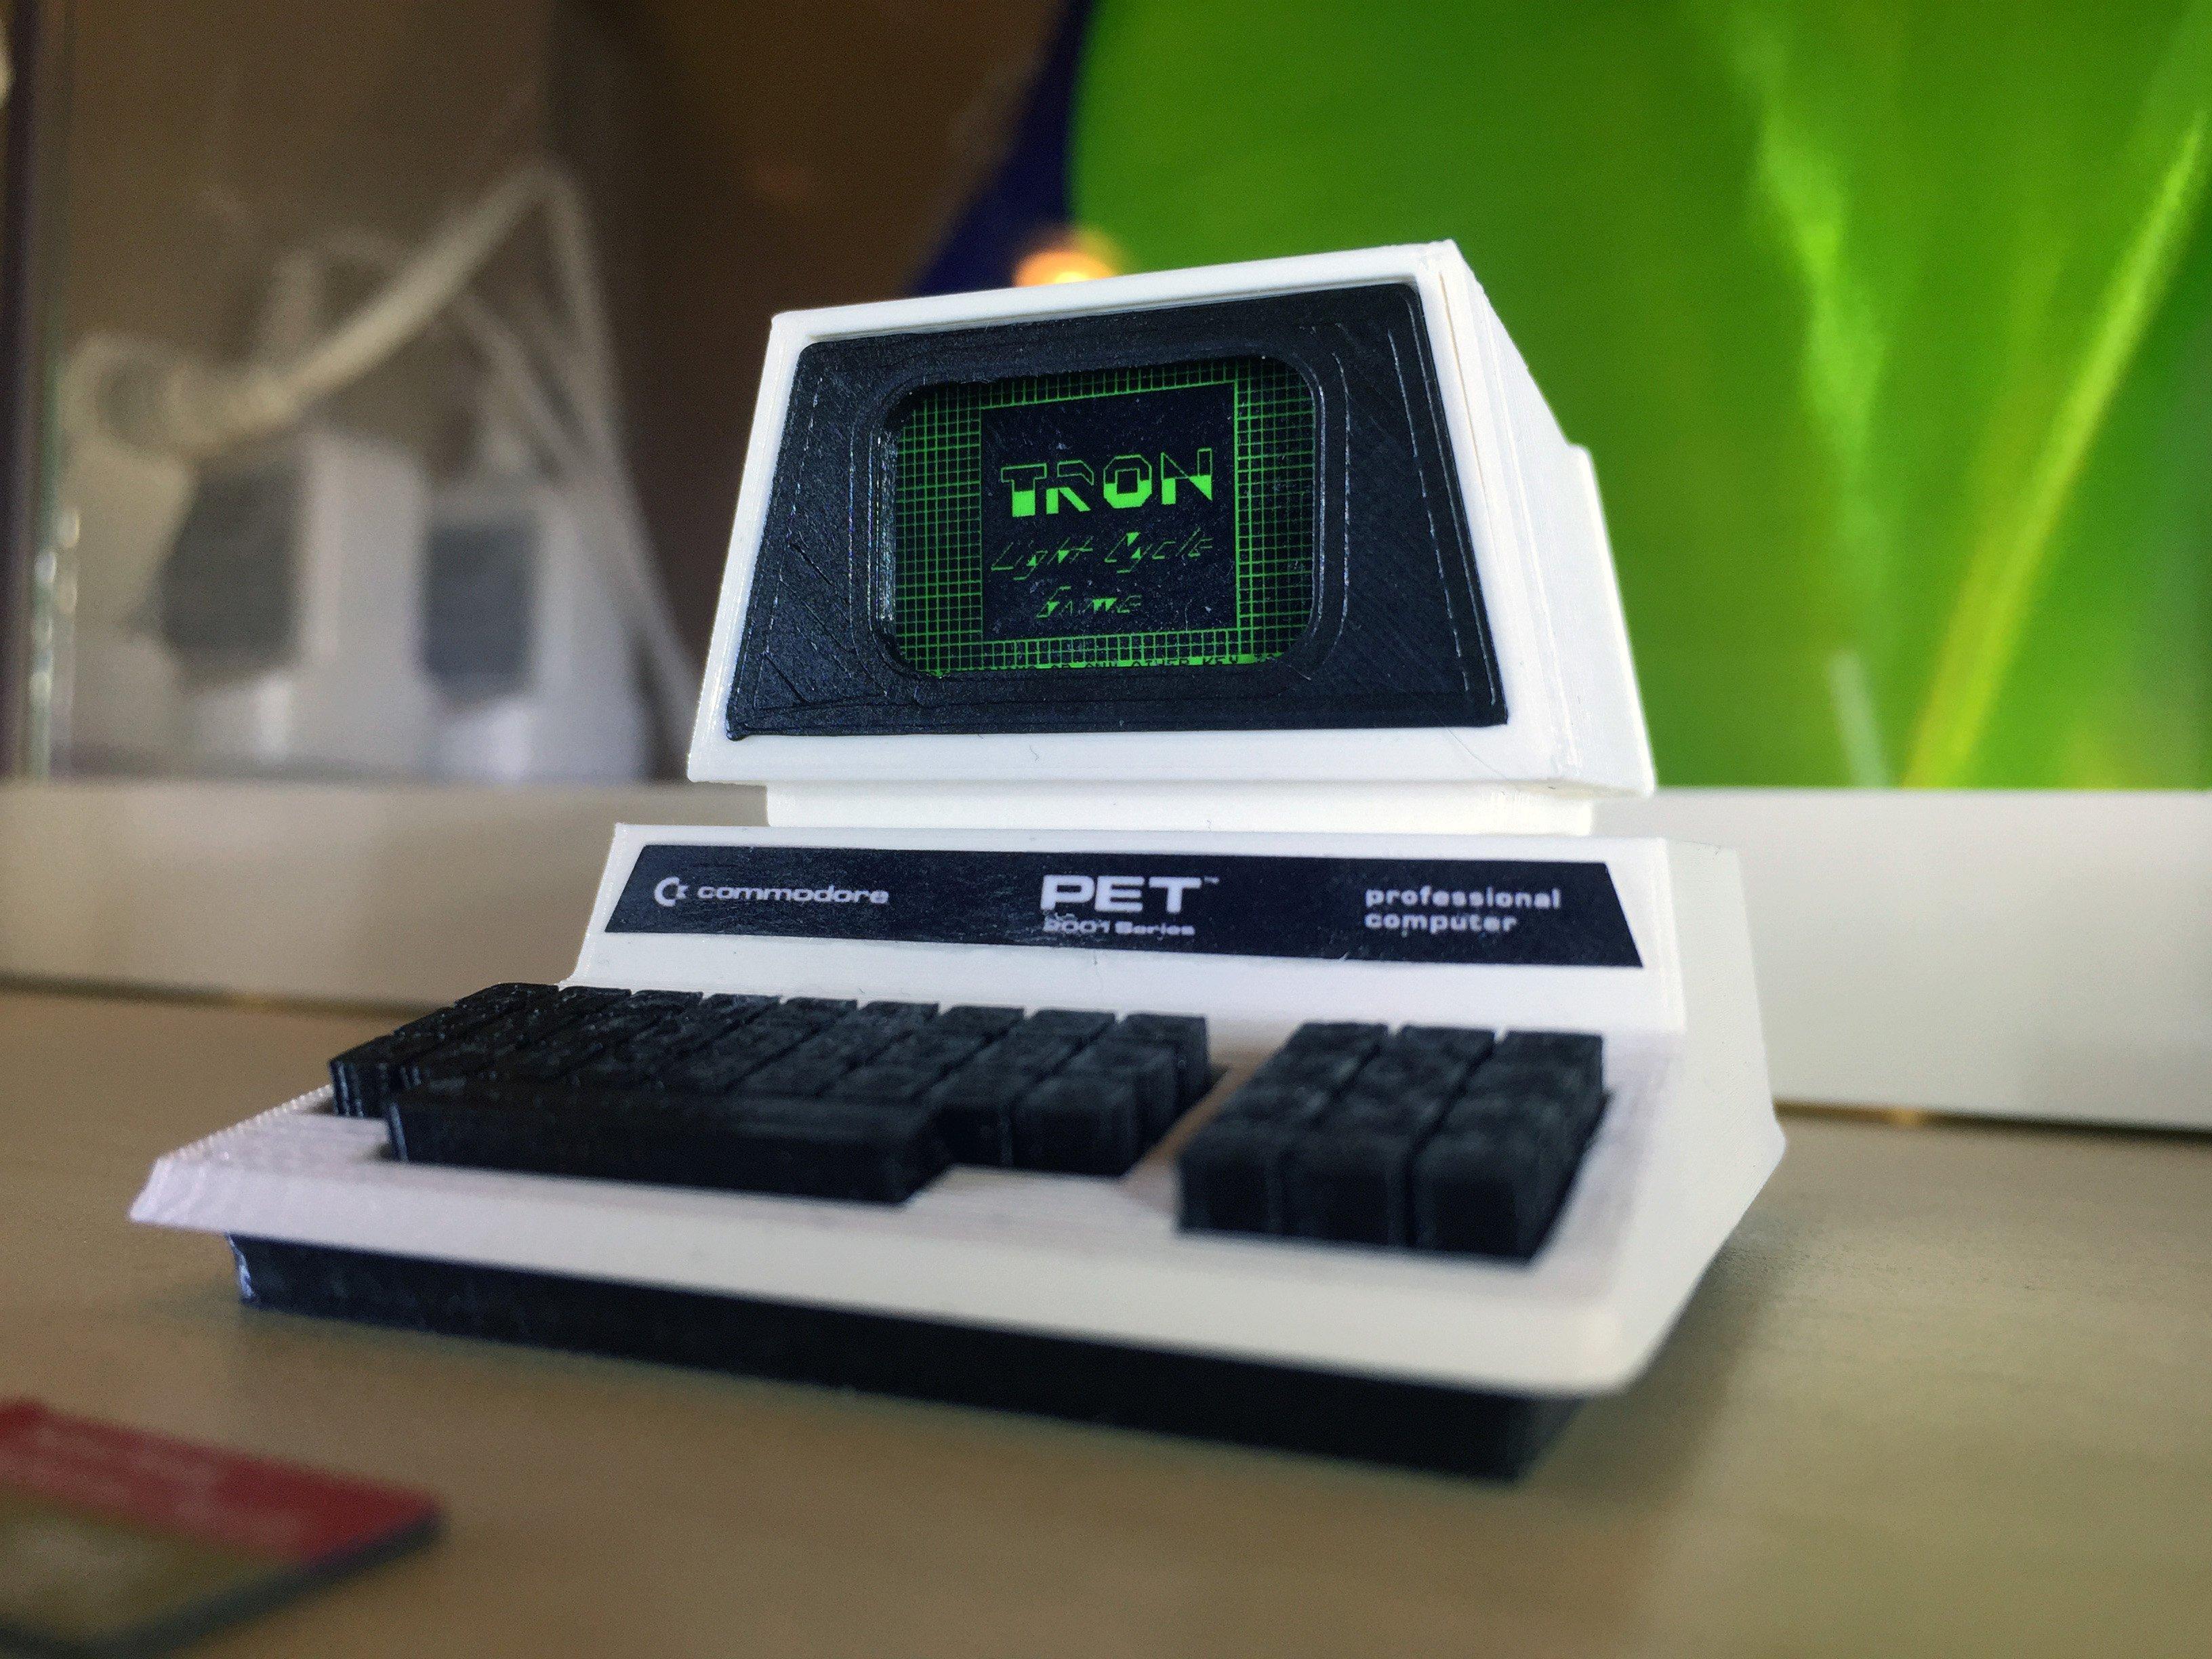 Mini Commodore PET series 2001N by RetromanIE